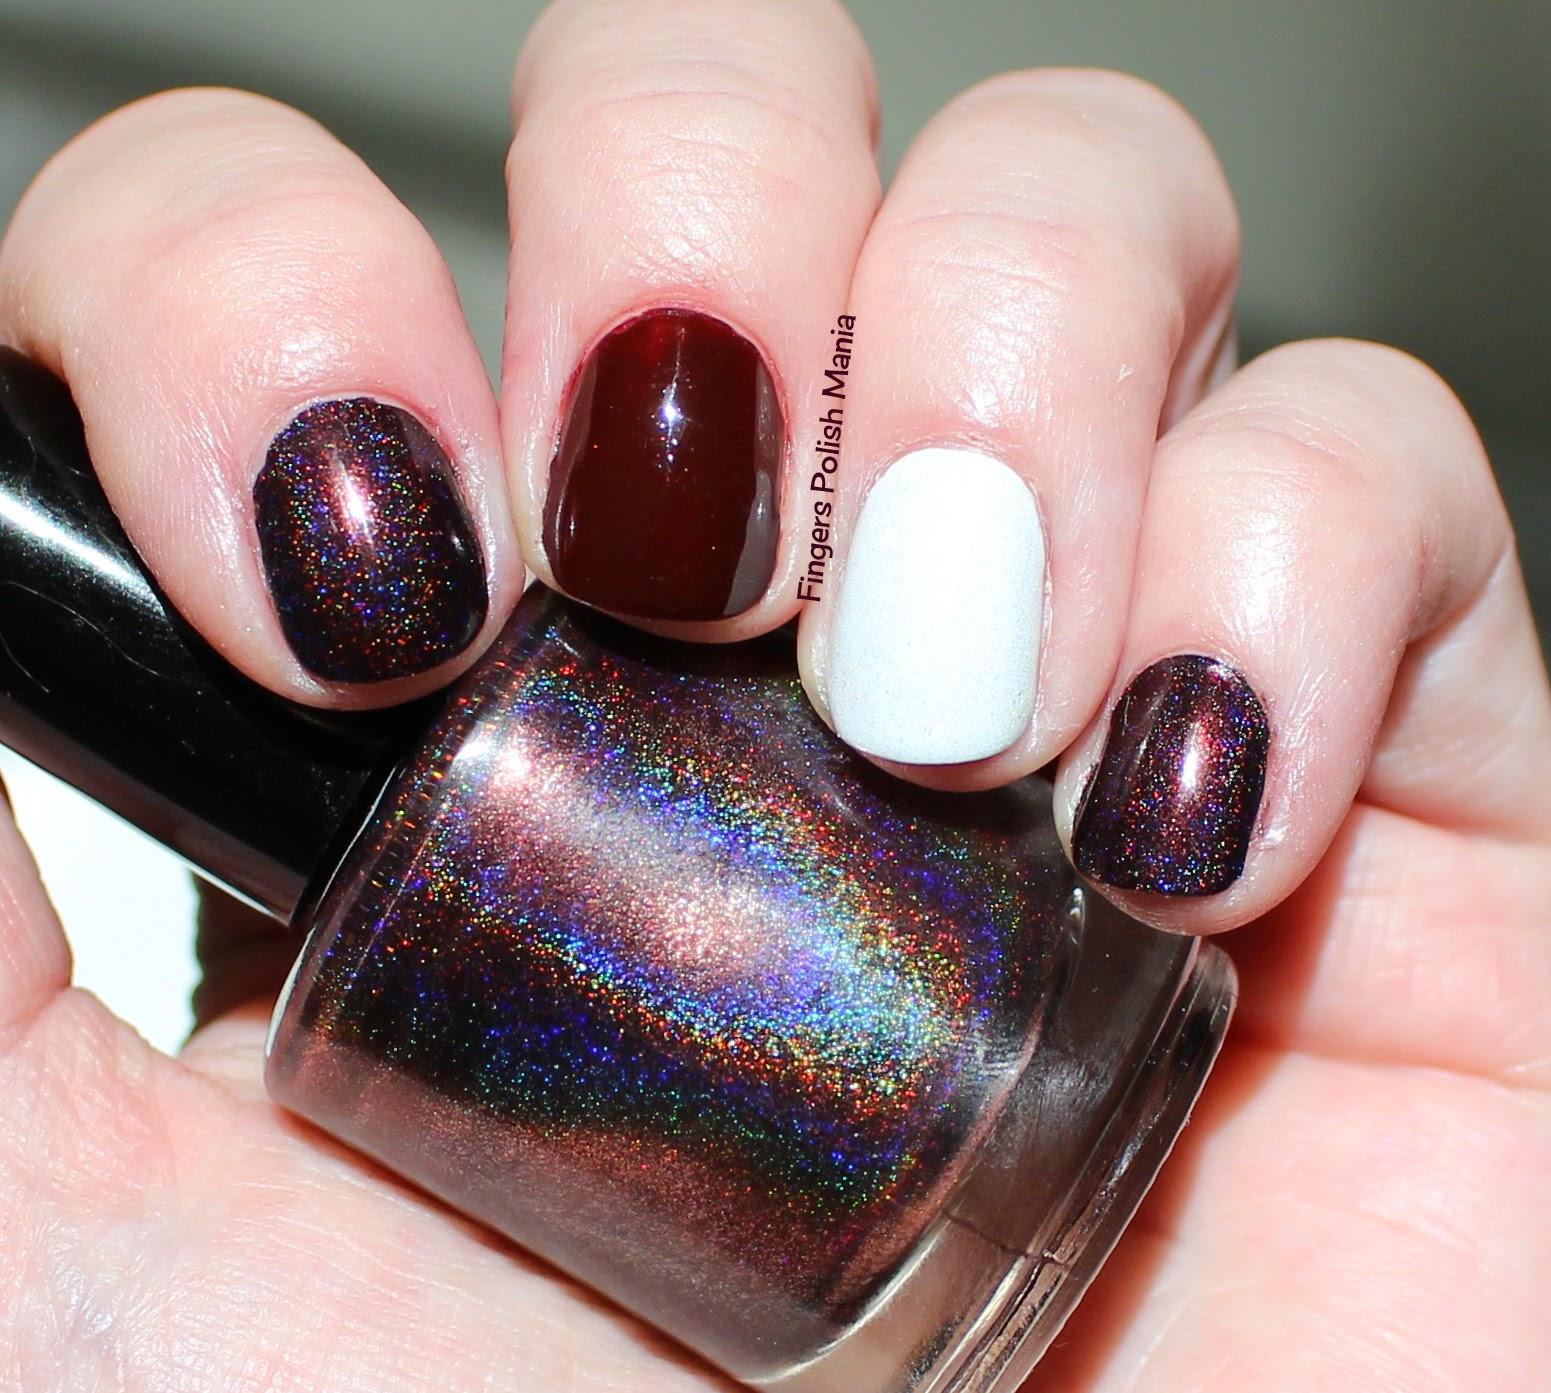 fingers polish mania: Enchanted Polish Sparkling Red Wine